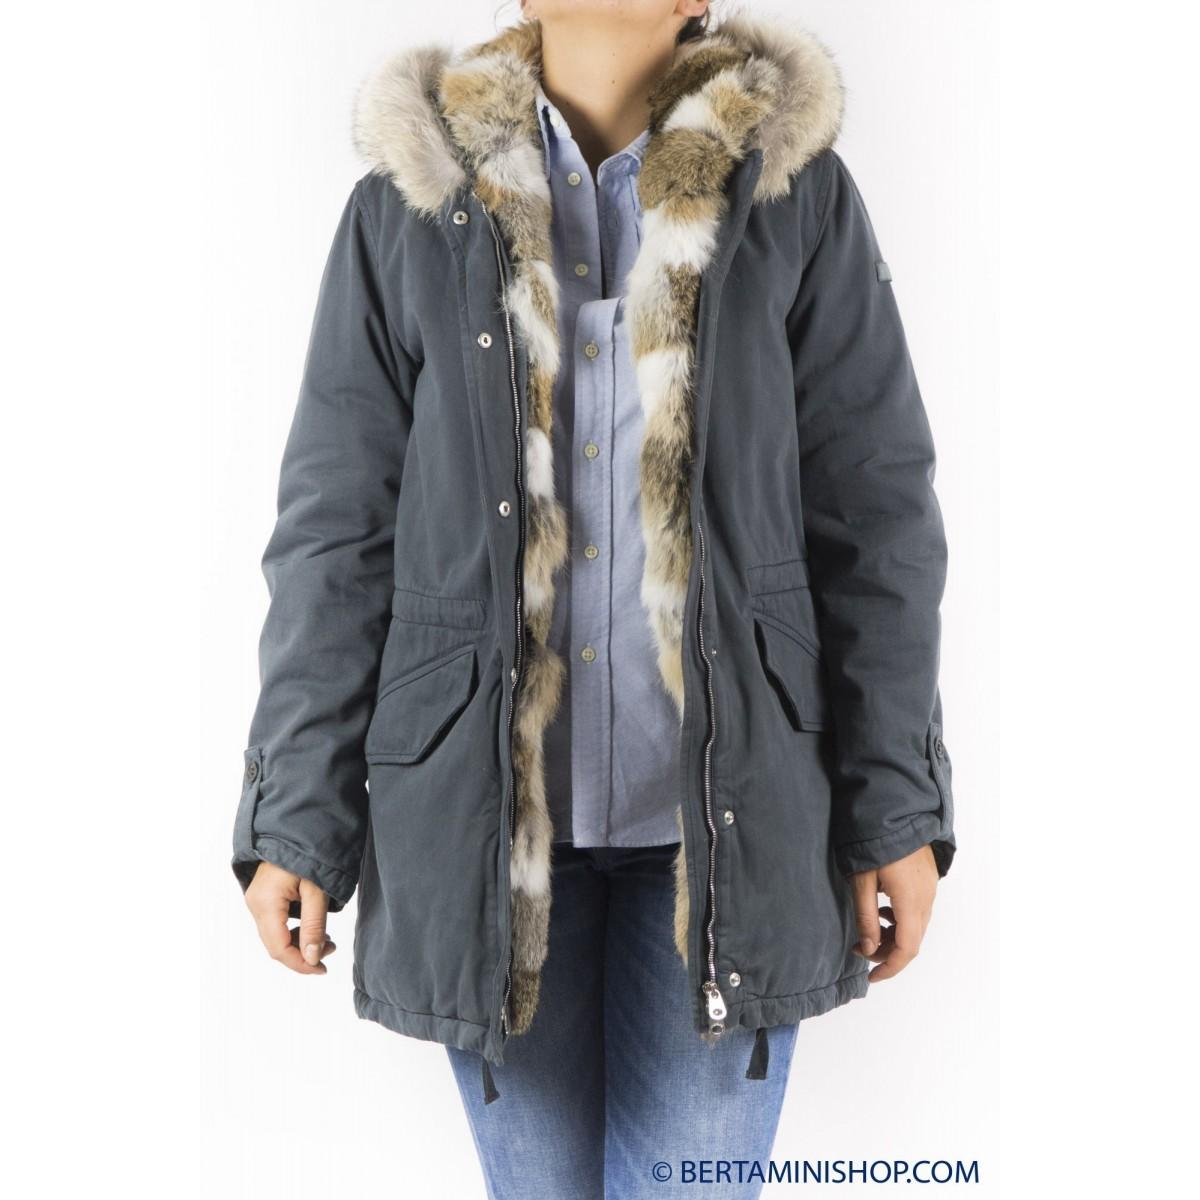 Piumino Lempelius - 239 7000 parka cappuccio pelliccia e bordo 96 - Smoky grey